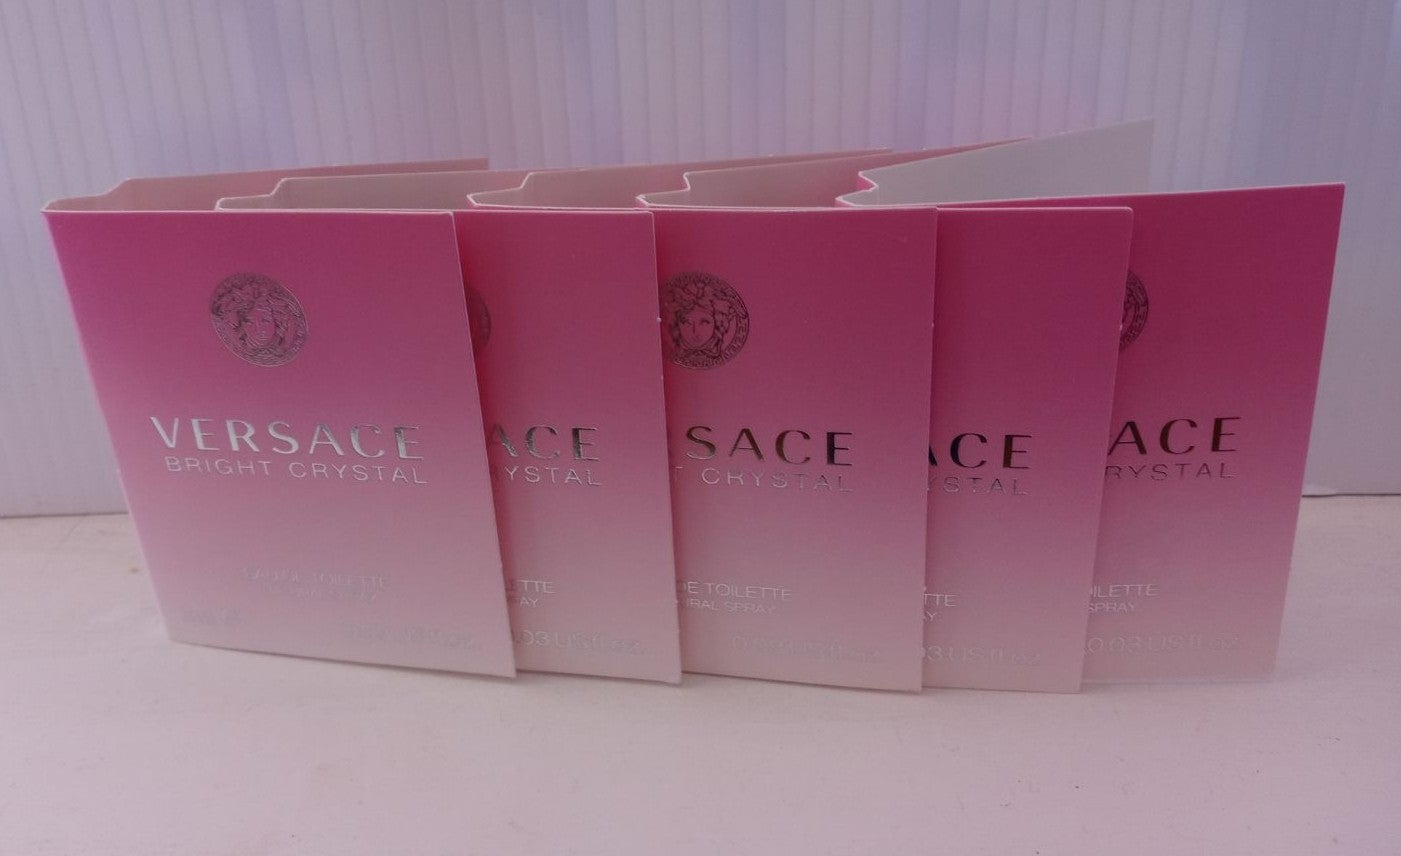 5 Versace Bright Crystal Spray 1ml/0.3oz